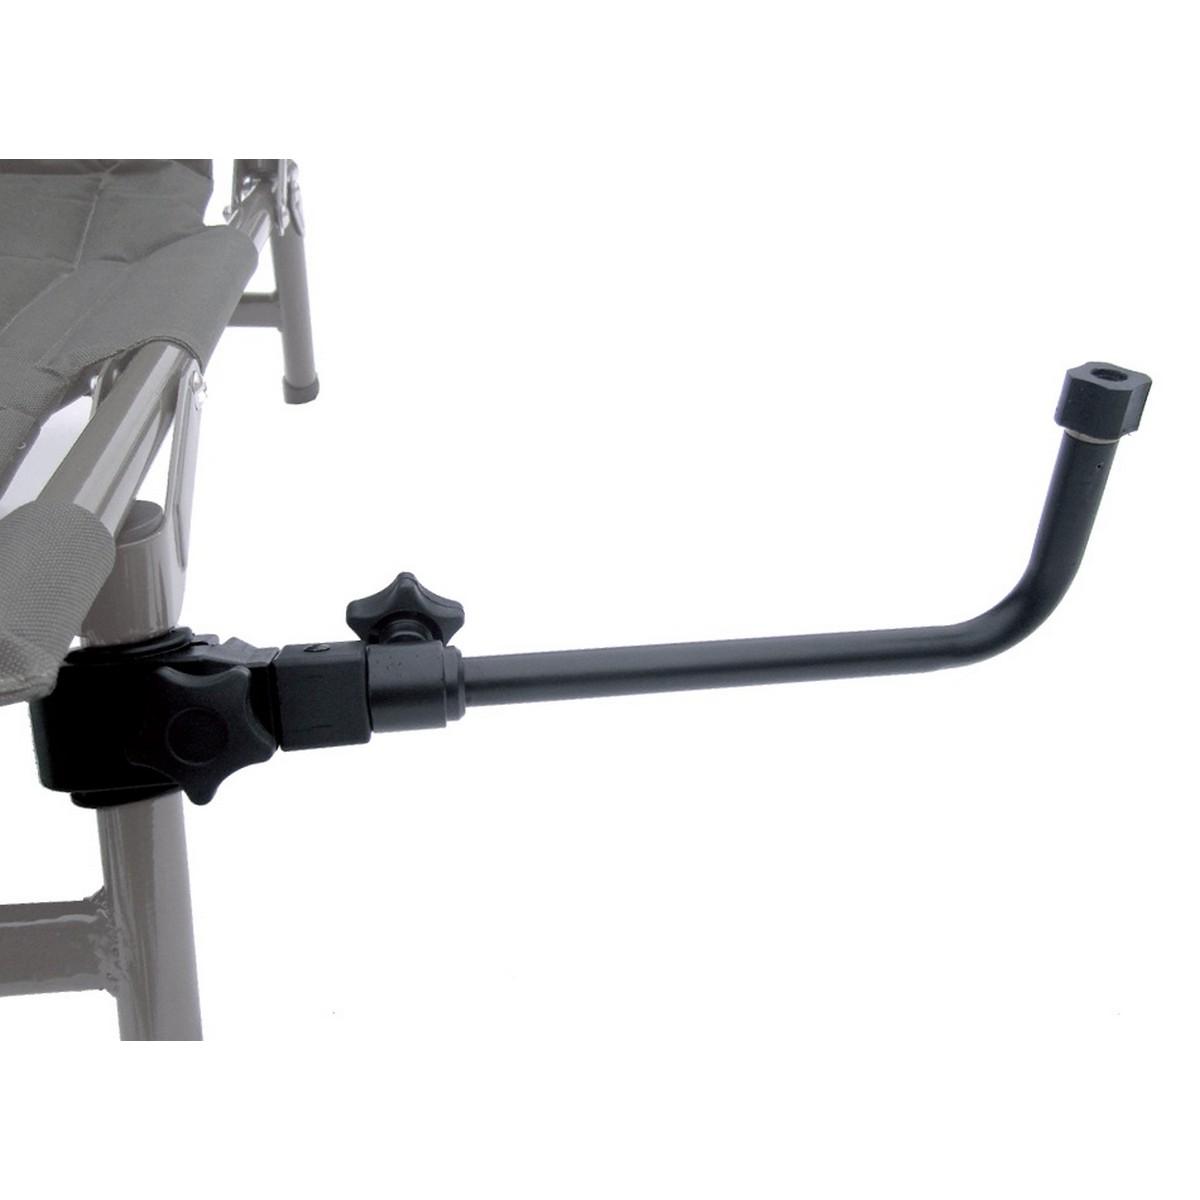 CZ Feeder Competition Keepnet Arm - прикачна за платформа държач за живарник